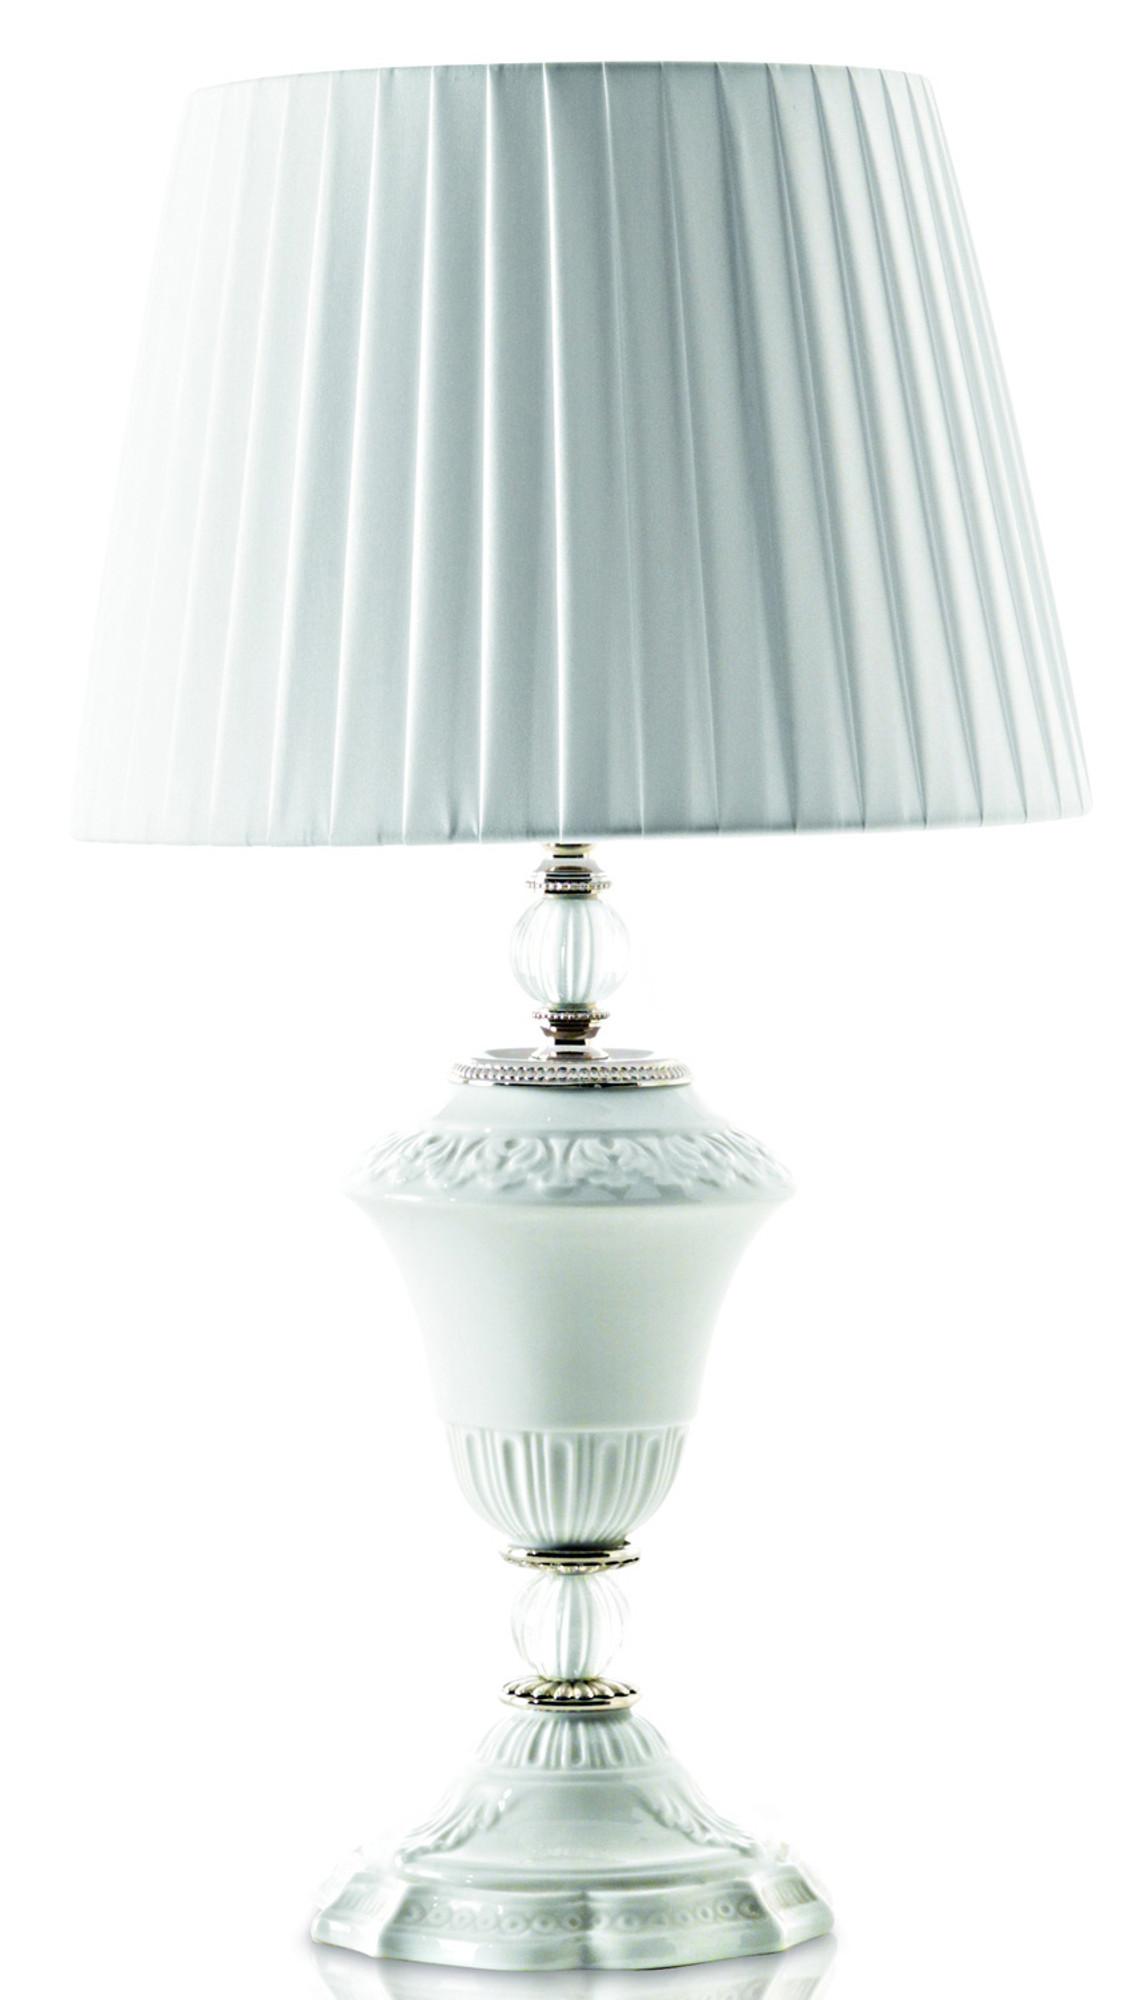 le porcellane vintage tischleuchte exklusive lampen aus europa online kaufen pinlight. Black Bedroom Furniture Sets. Home Design Ideas